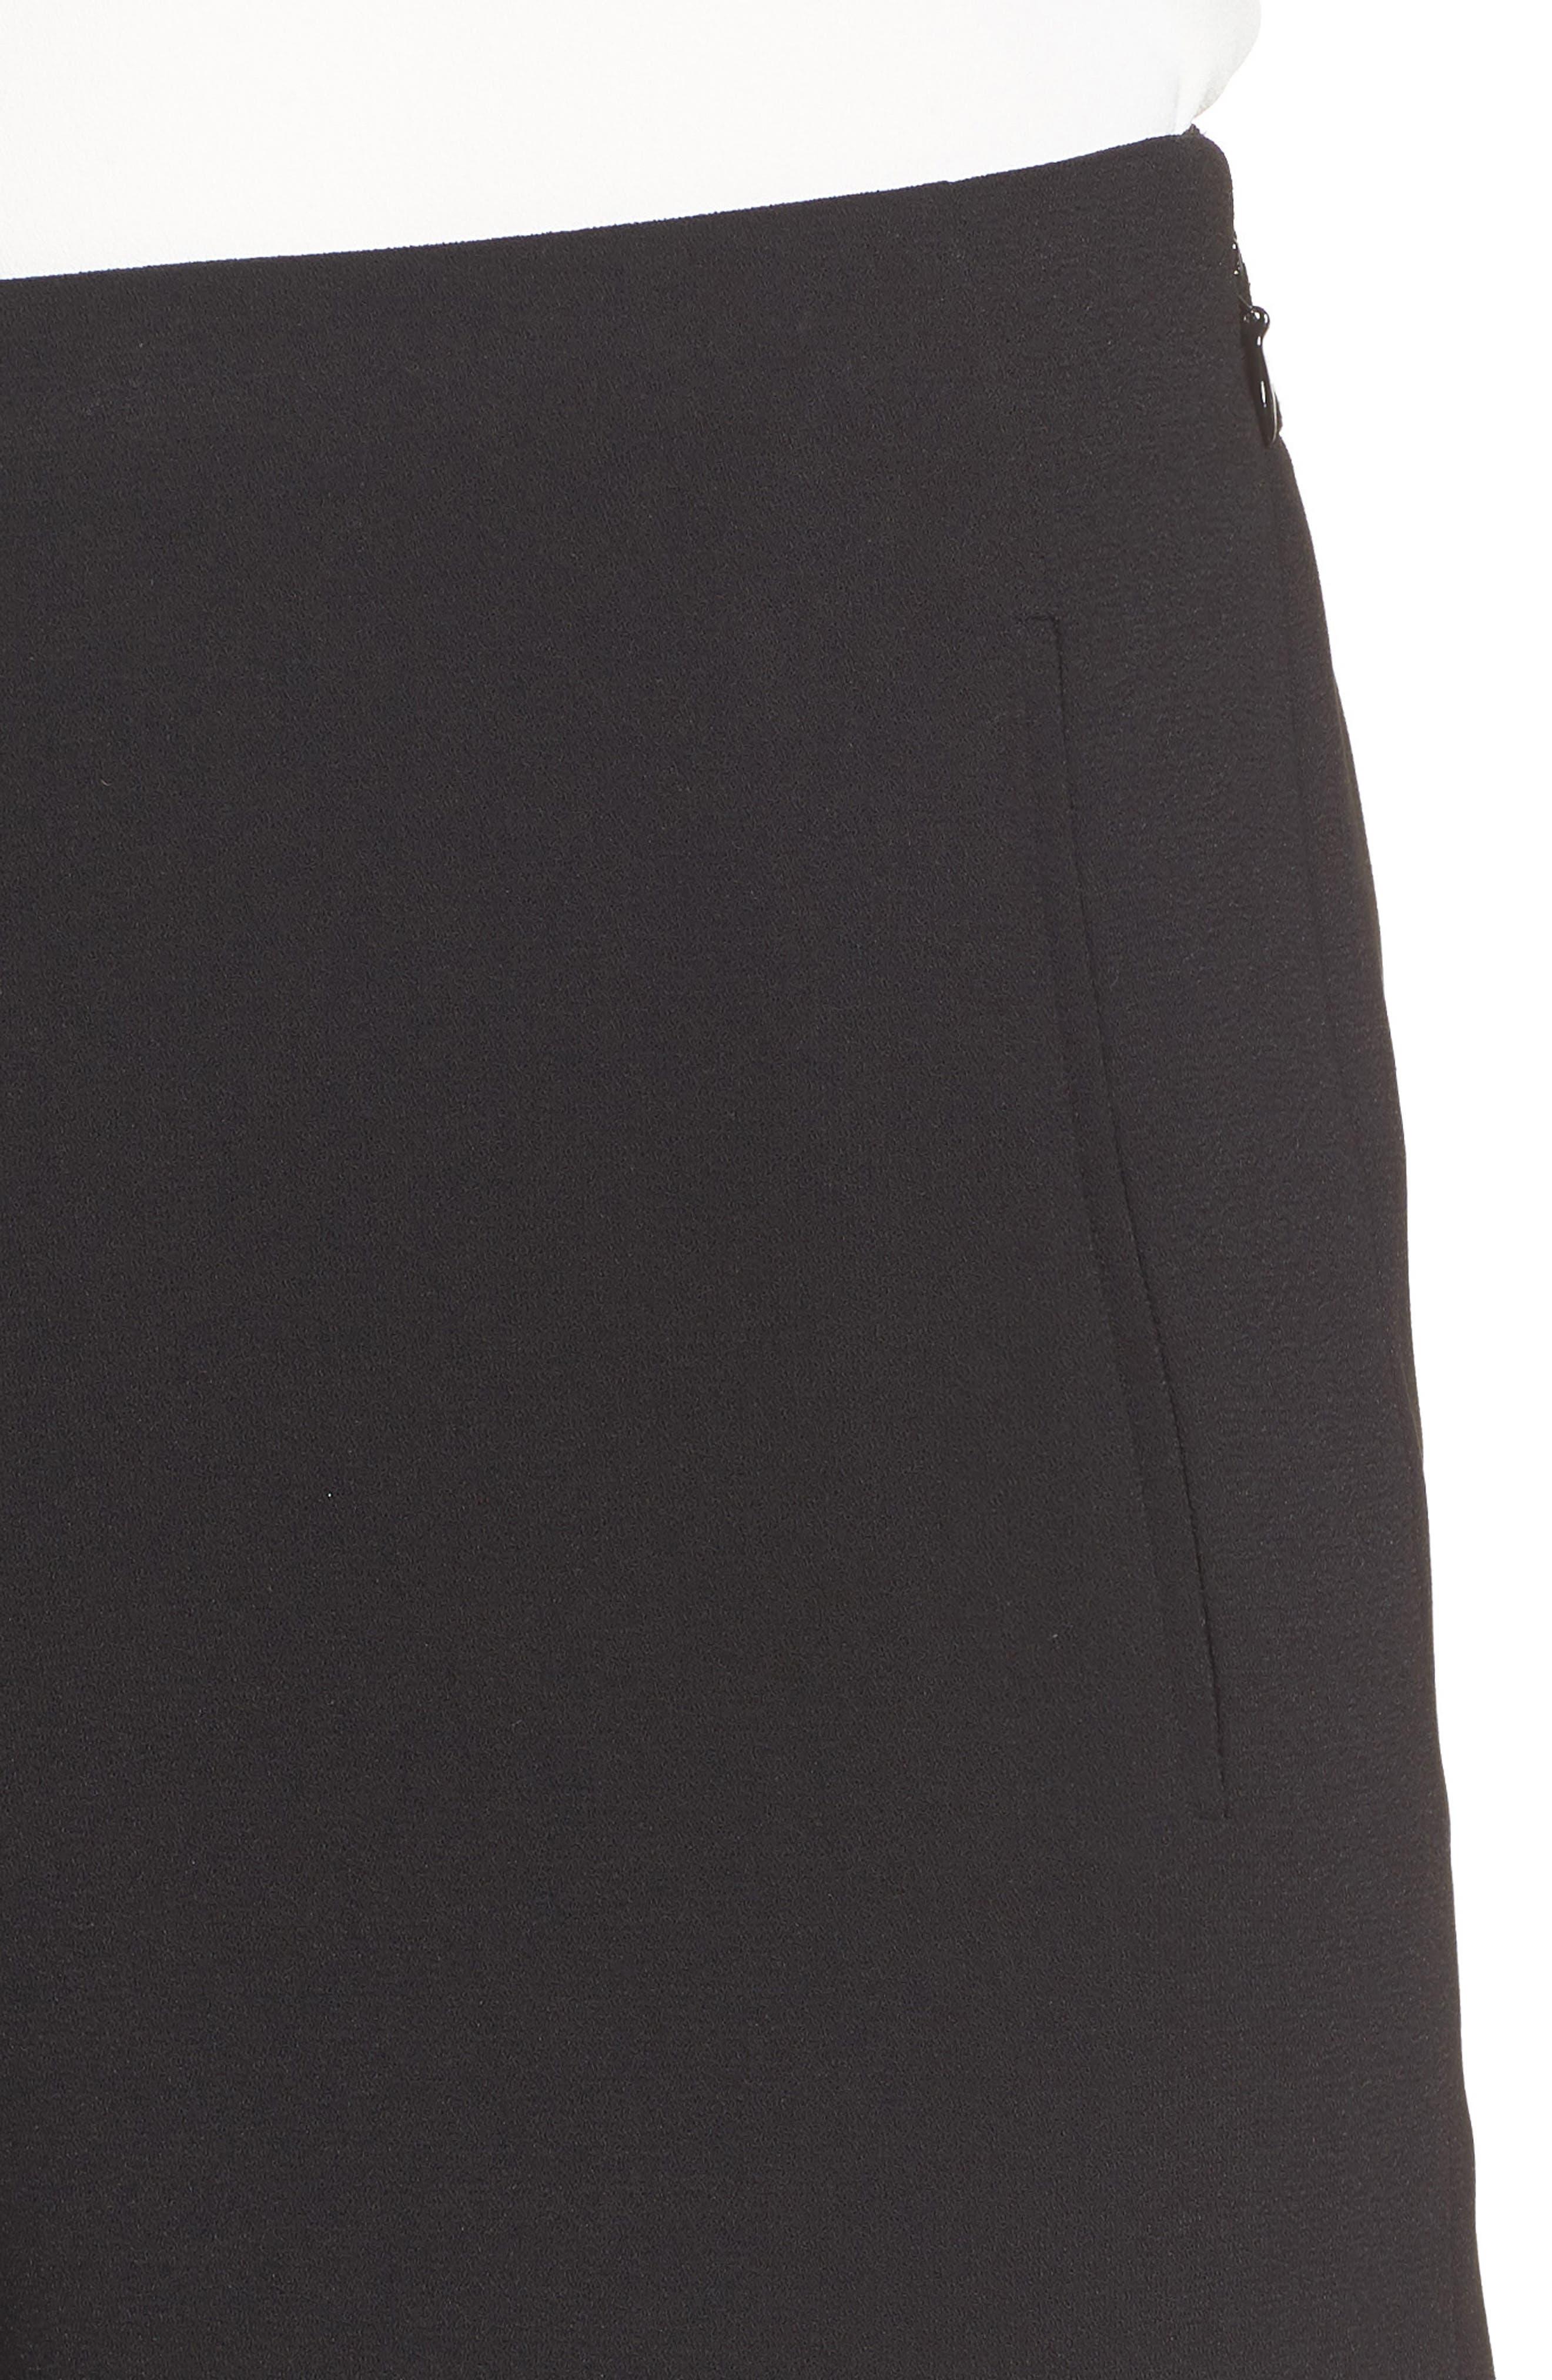 Crepe Straight Leg Pants,                             Alternate thumbnail 5, color,                             006